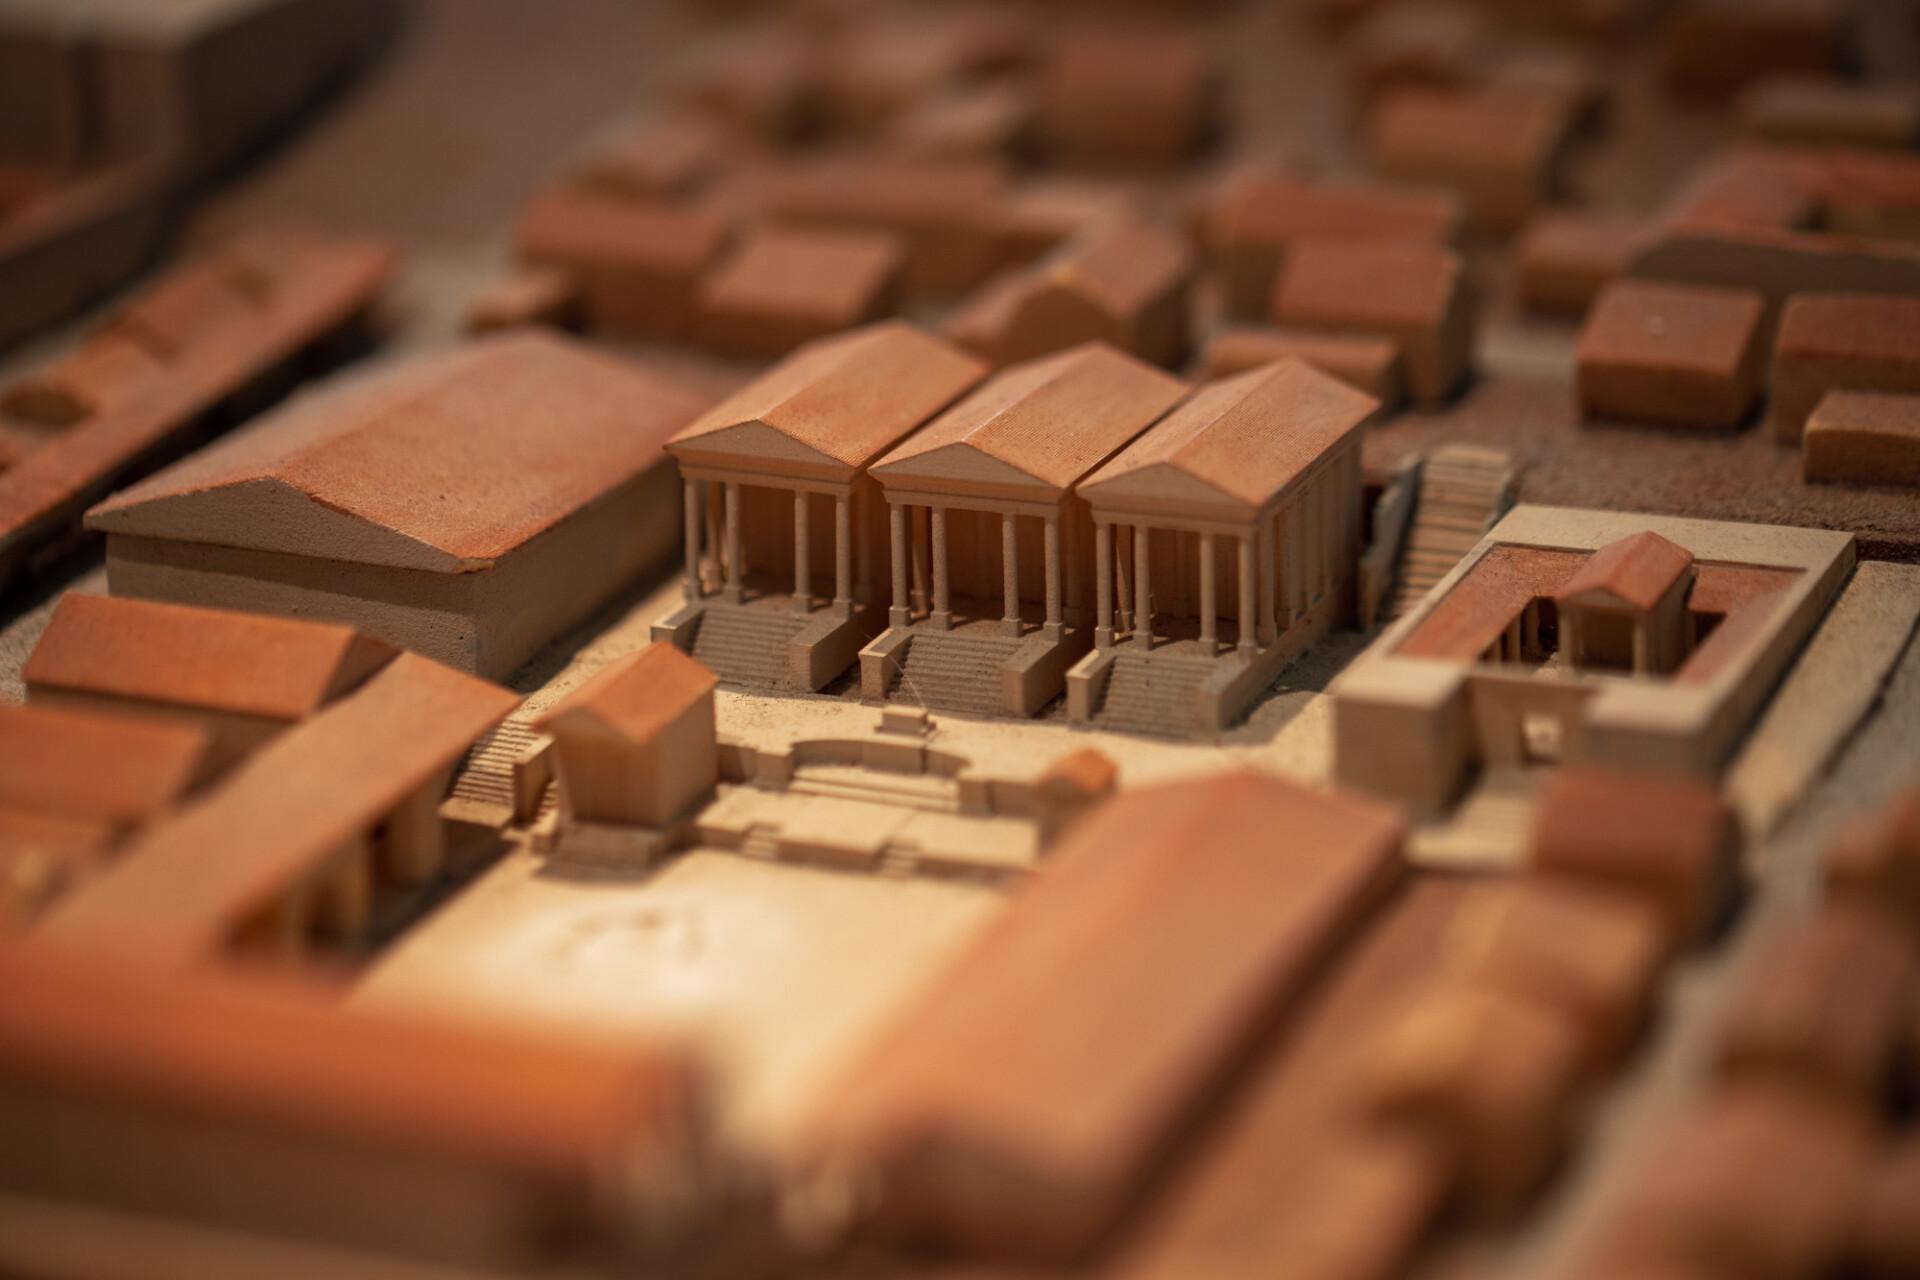 Roman model workshop